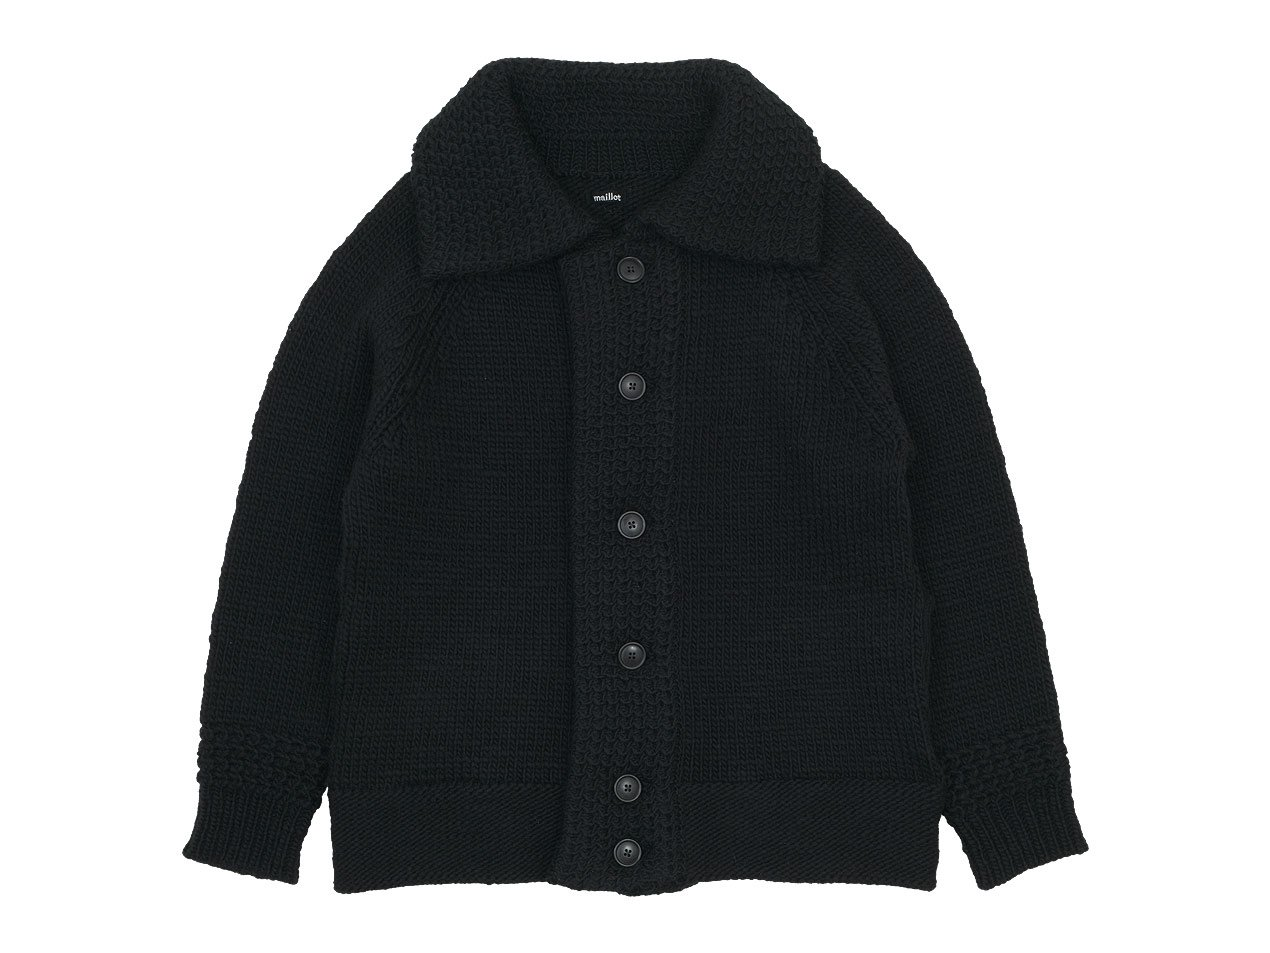 maillot mature hand frame fisherman jacket BLACK